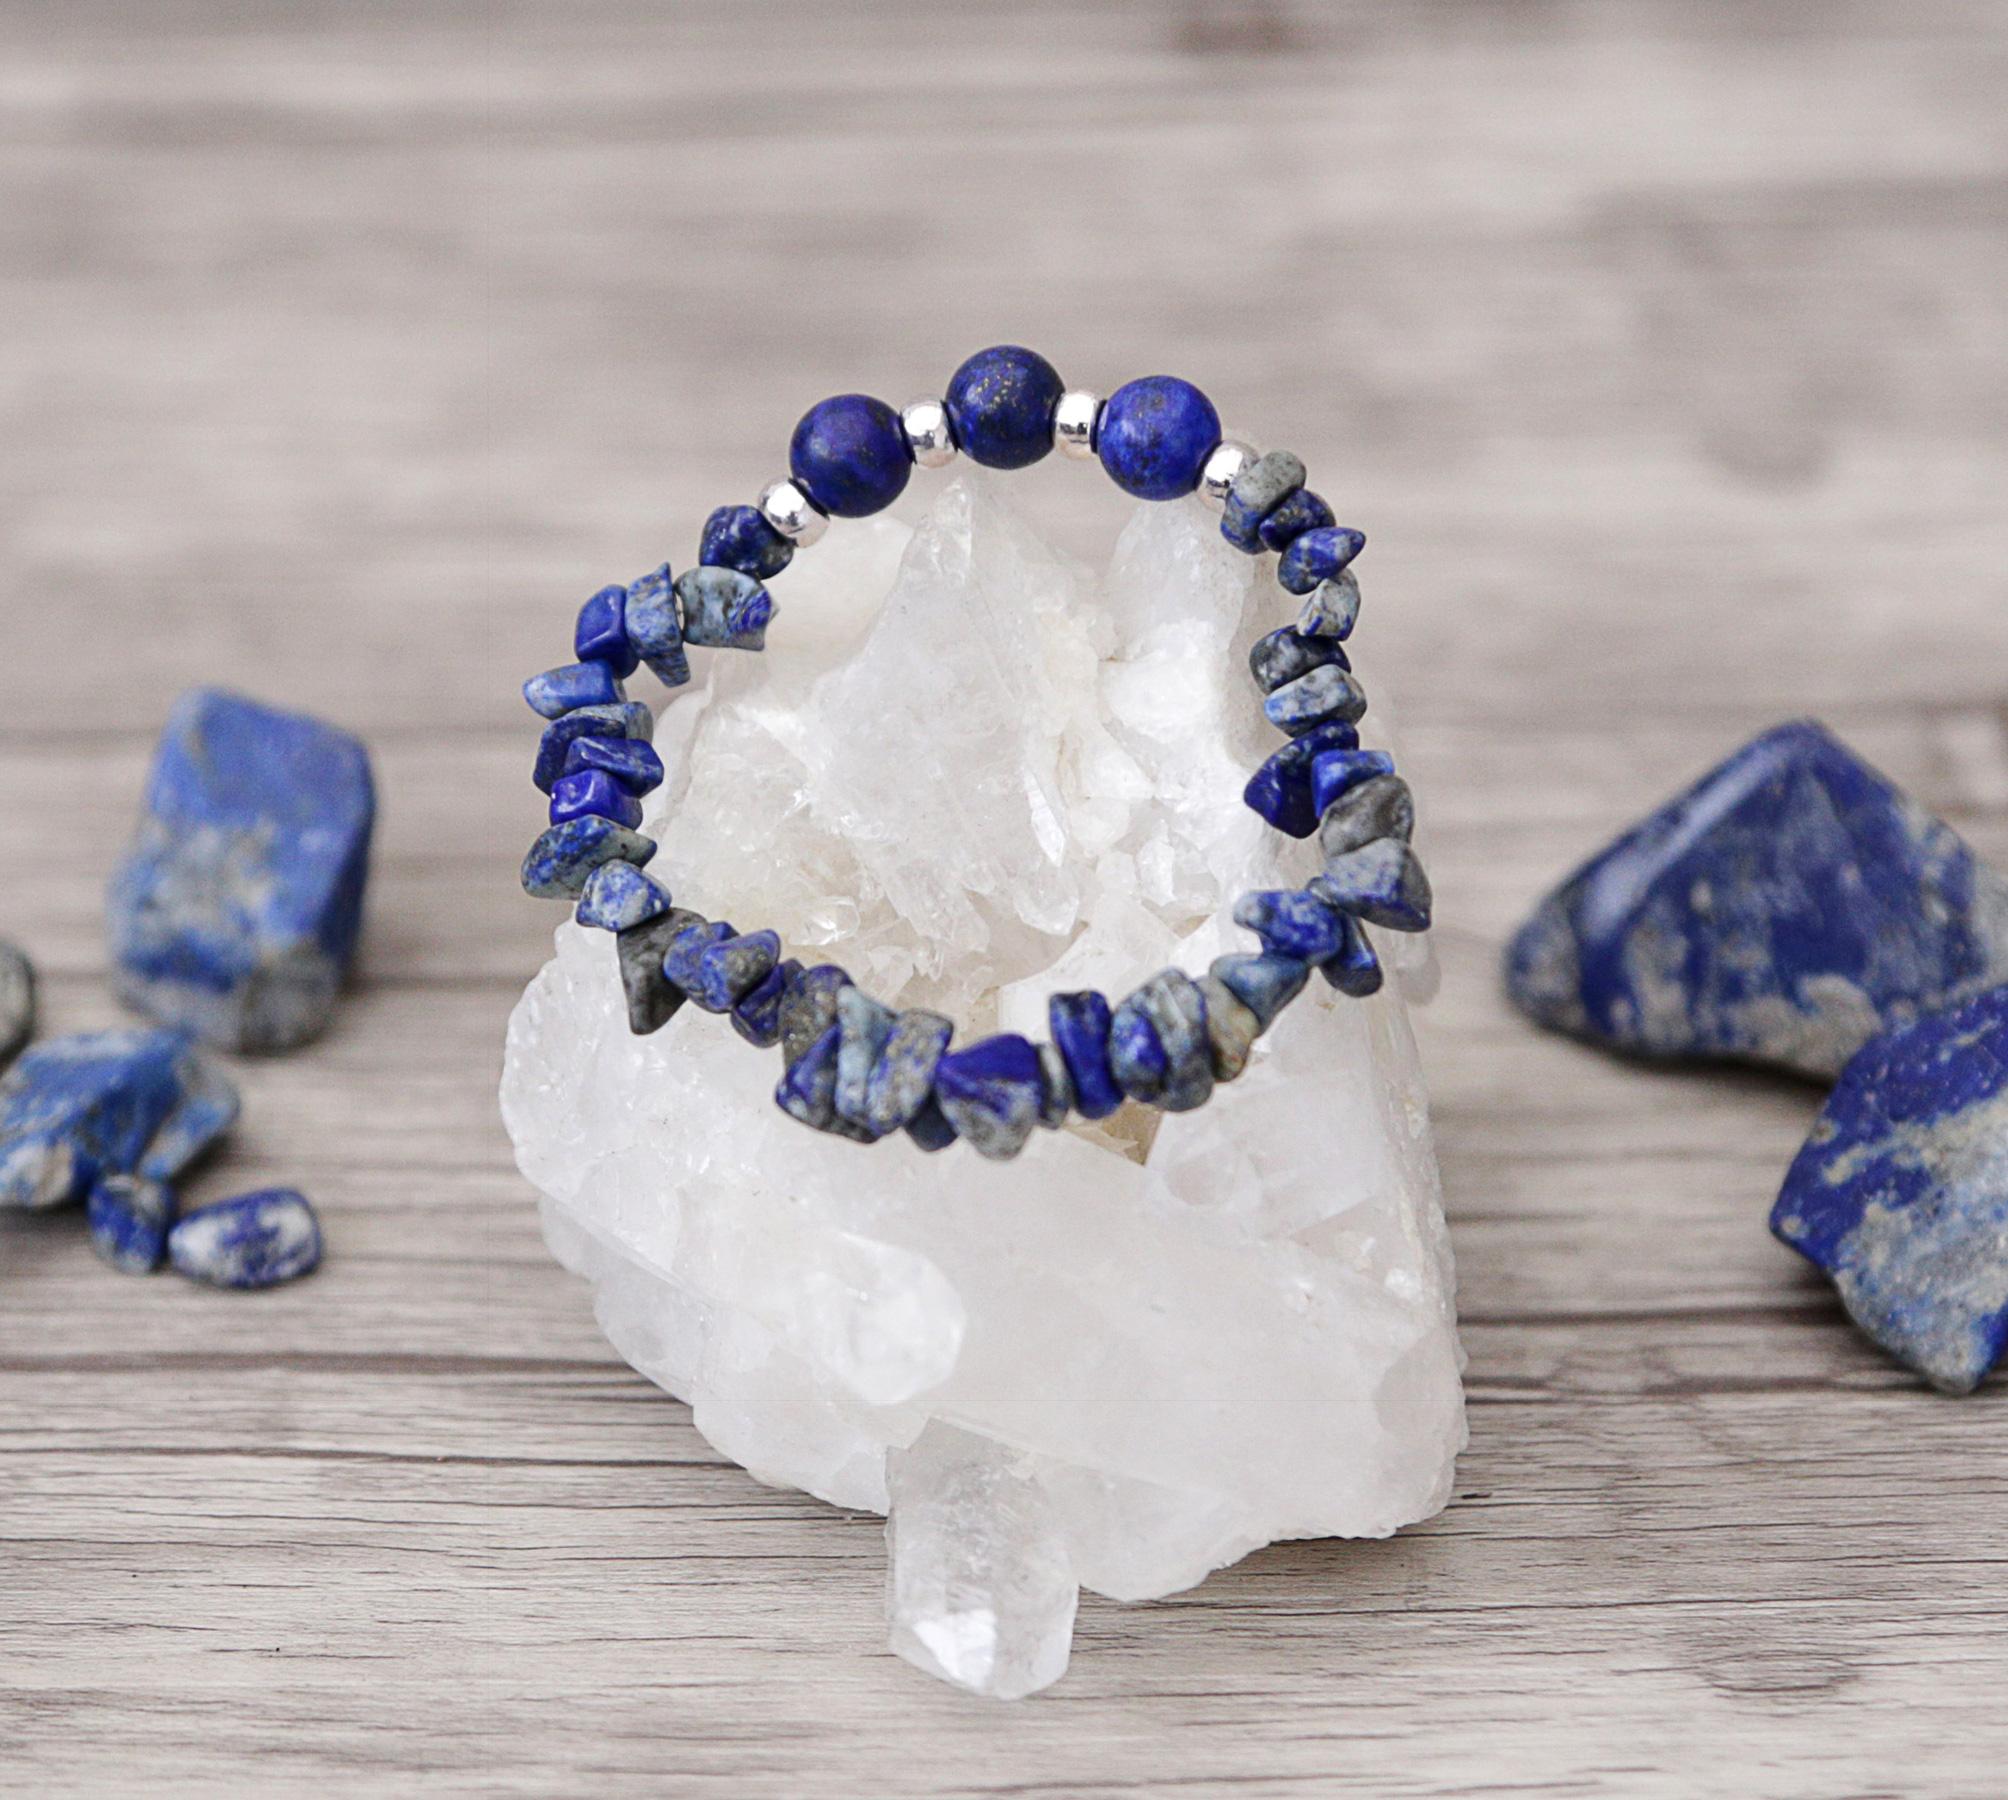 piedra-picada-lapislázuli-piamaria-cl